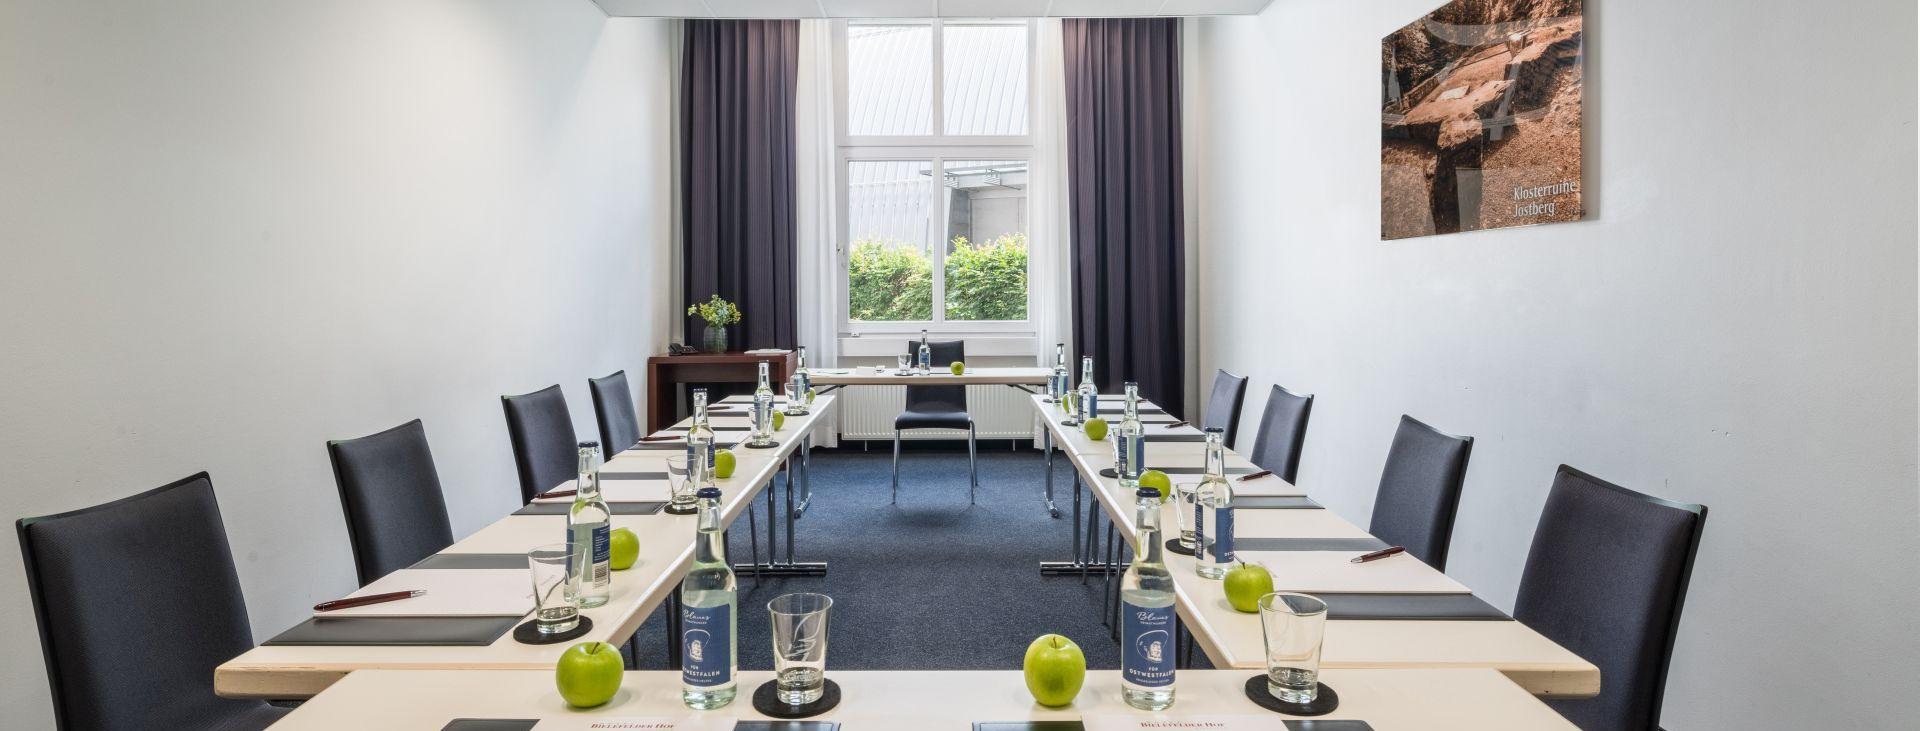 Jostberg Schmal Seminarraum Bielefelder Hof